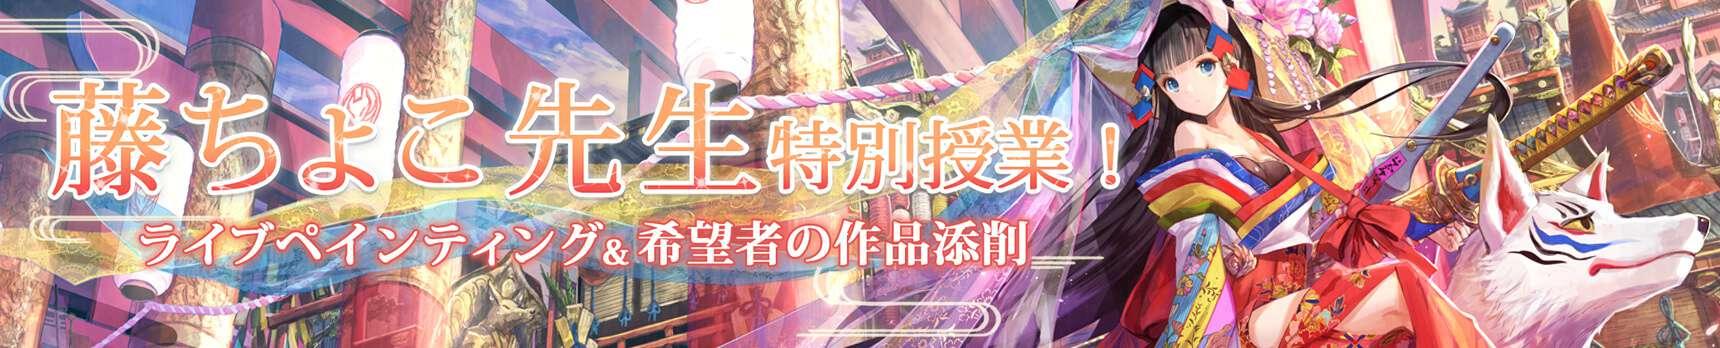 Fujichoko re banner pc